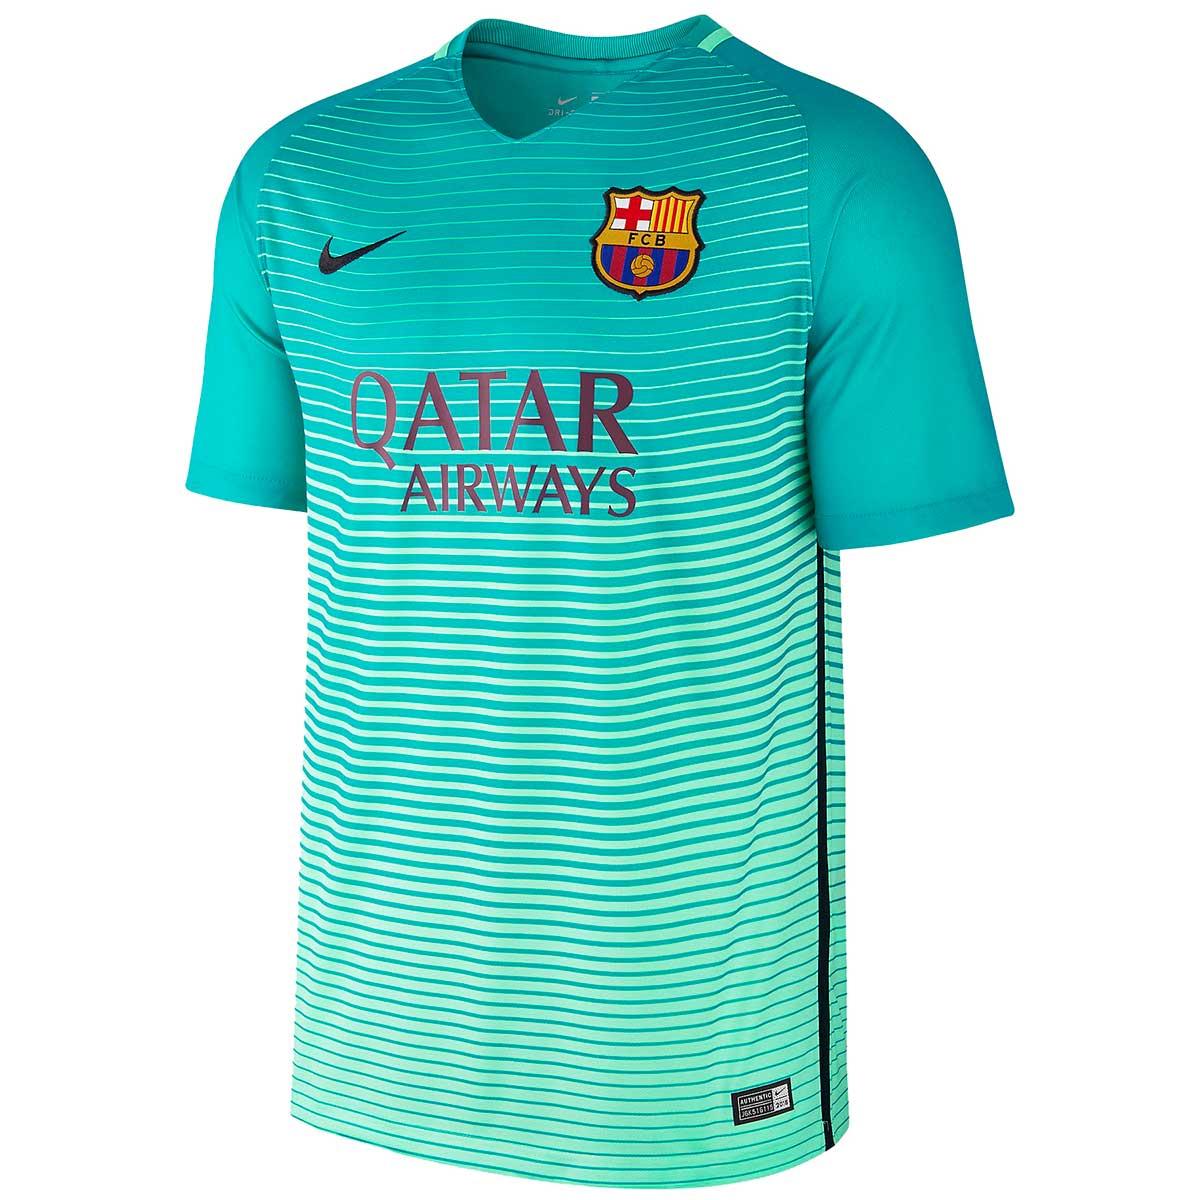 Buy Nike Fc Barcelona Jersey Online India Barca Jersey Online